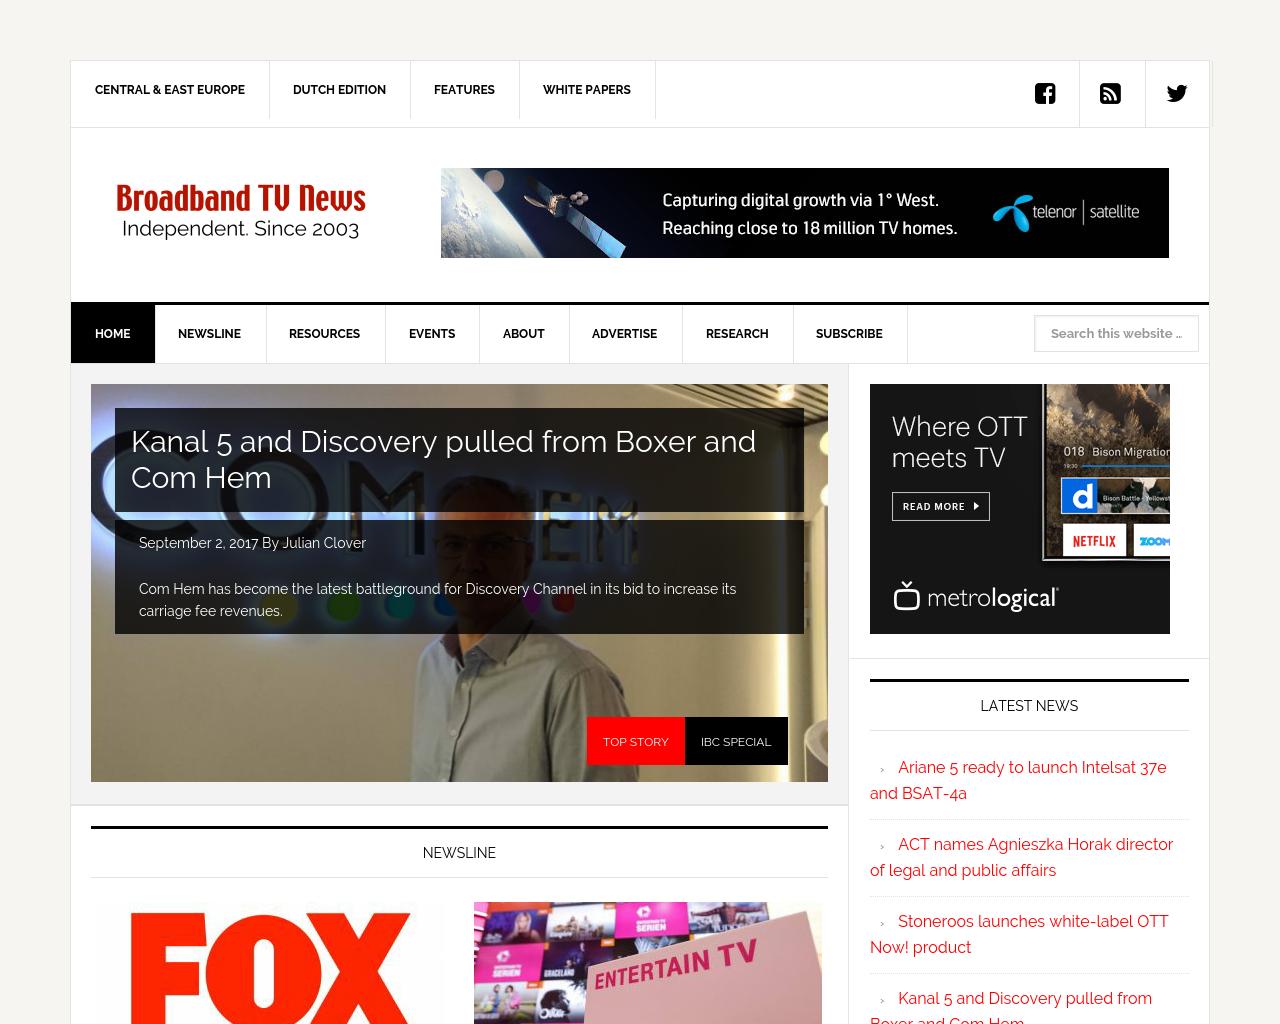 Broadband-TV-News-Advertising-Reviews-Pricing